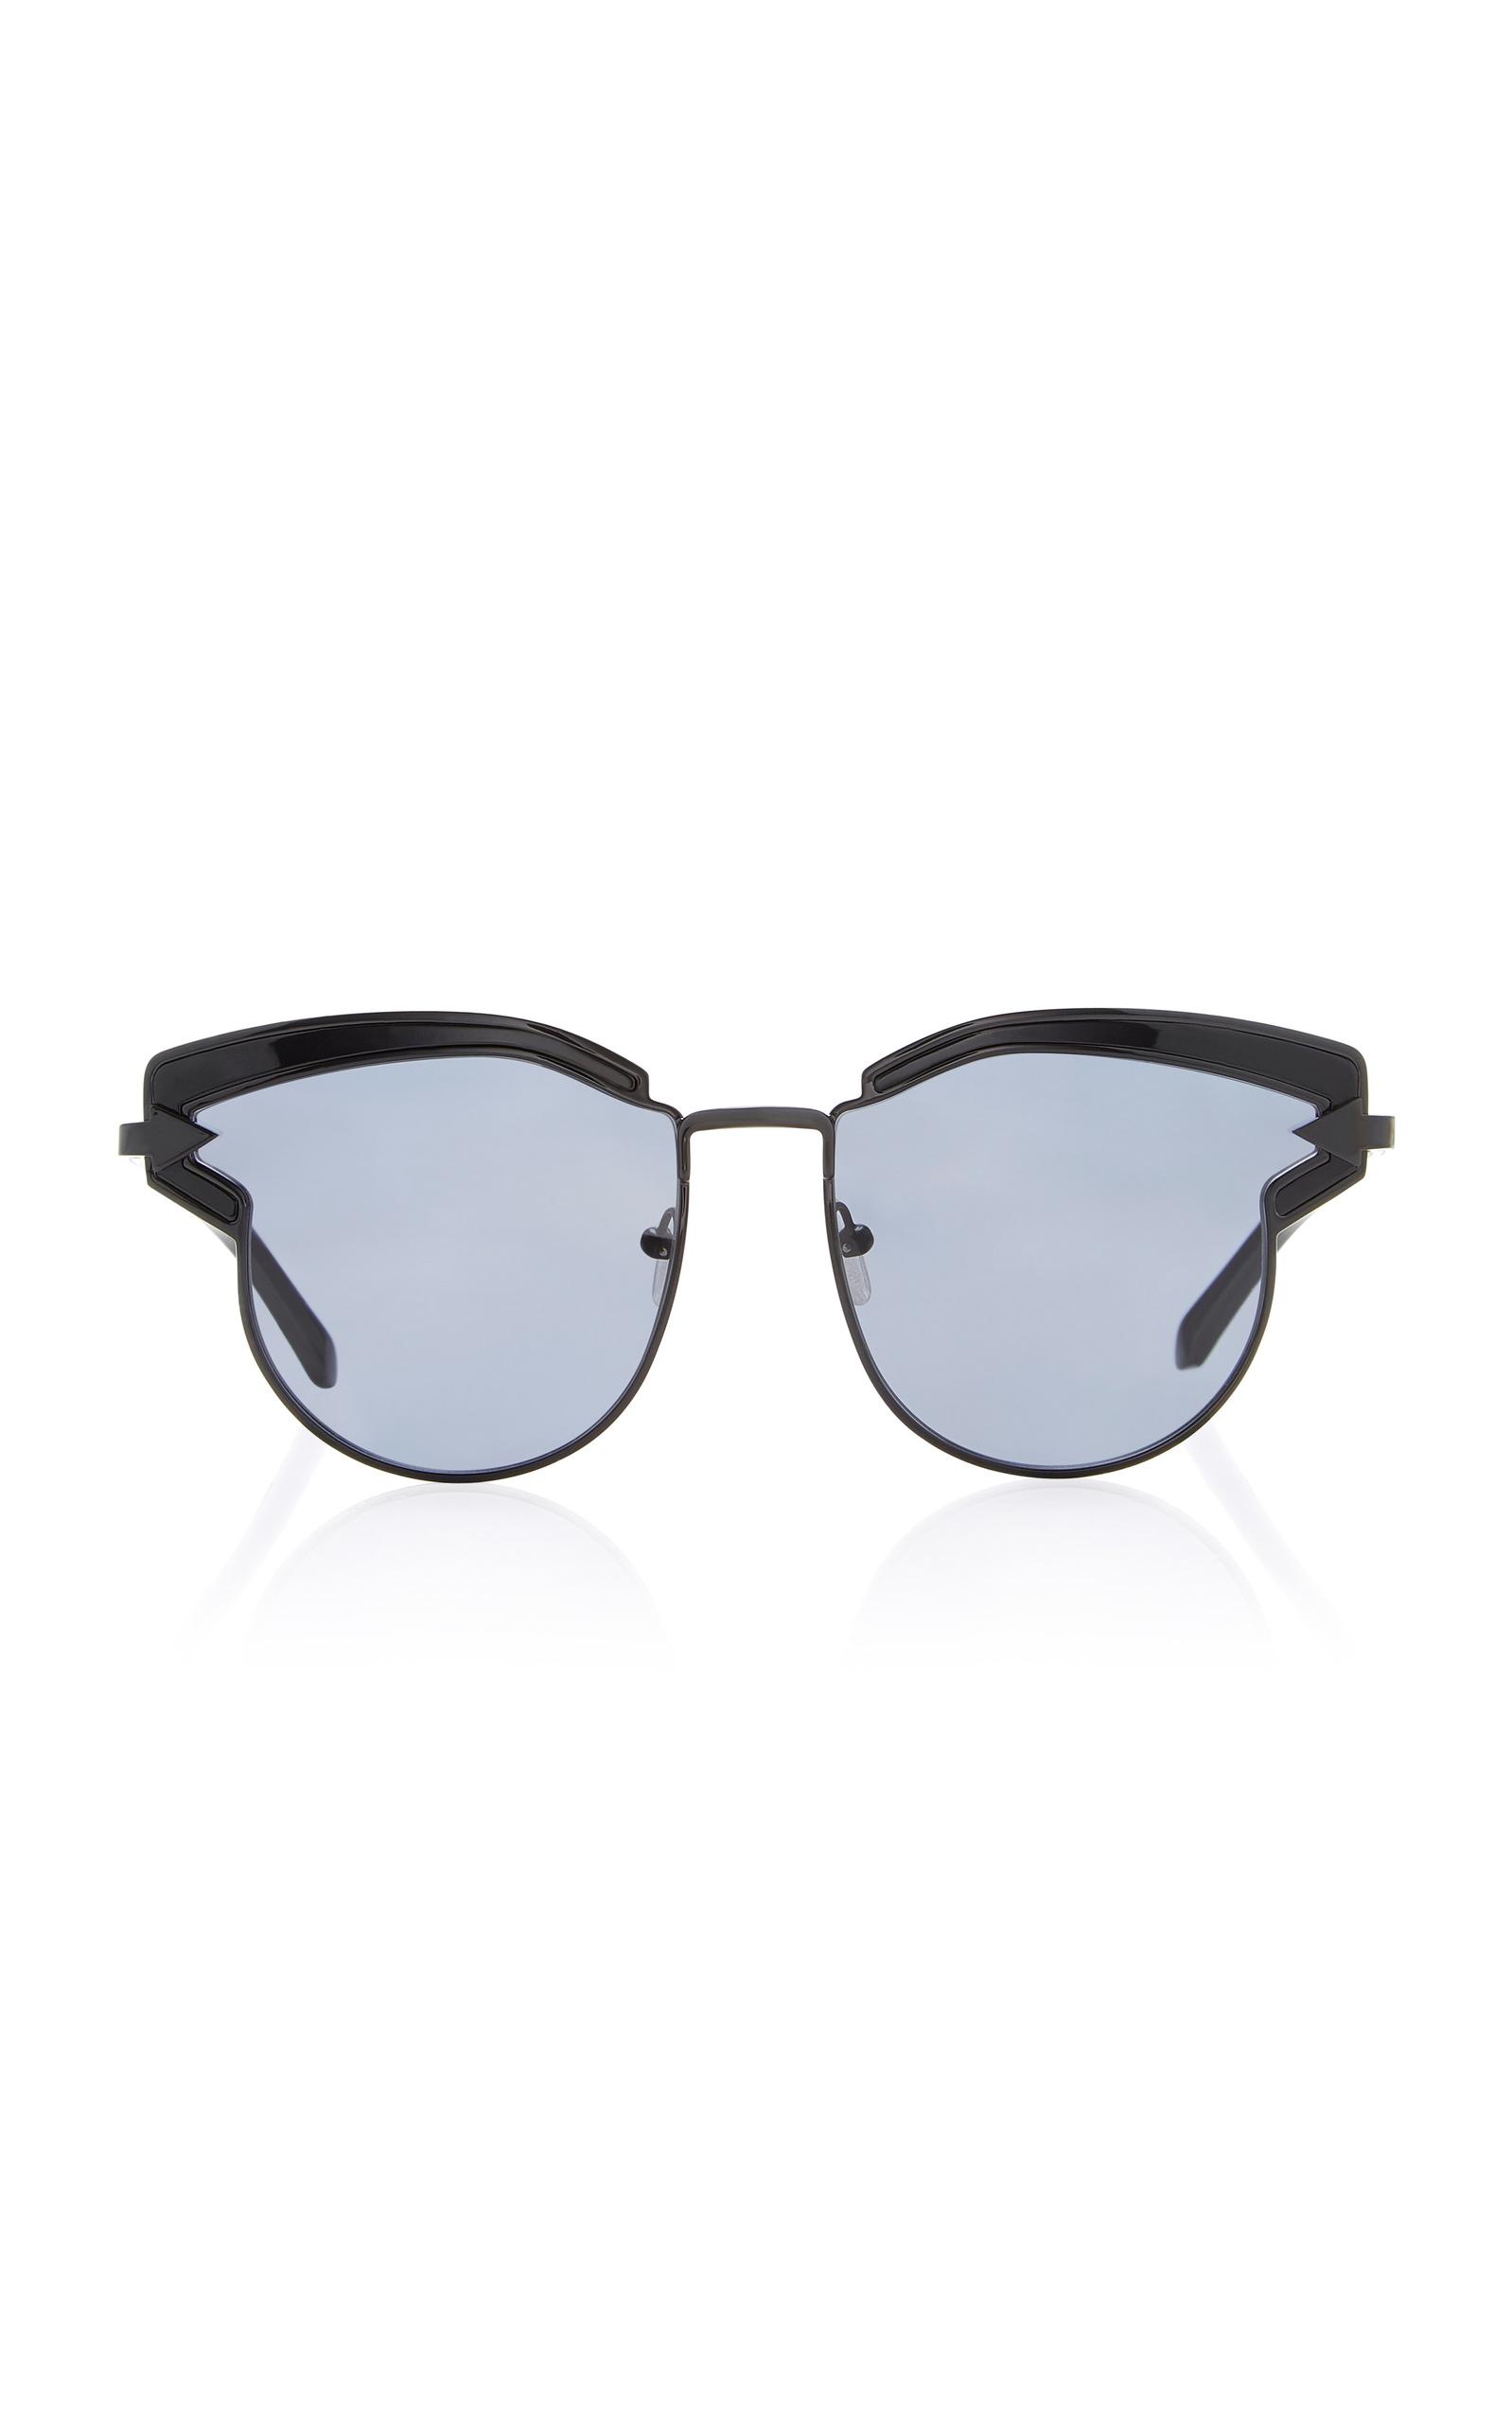 791a7b9aa6be Superstar Felipe Cat-Eye Acetate Sunglasses by Karen Walker